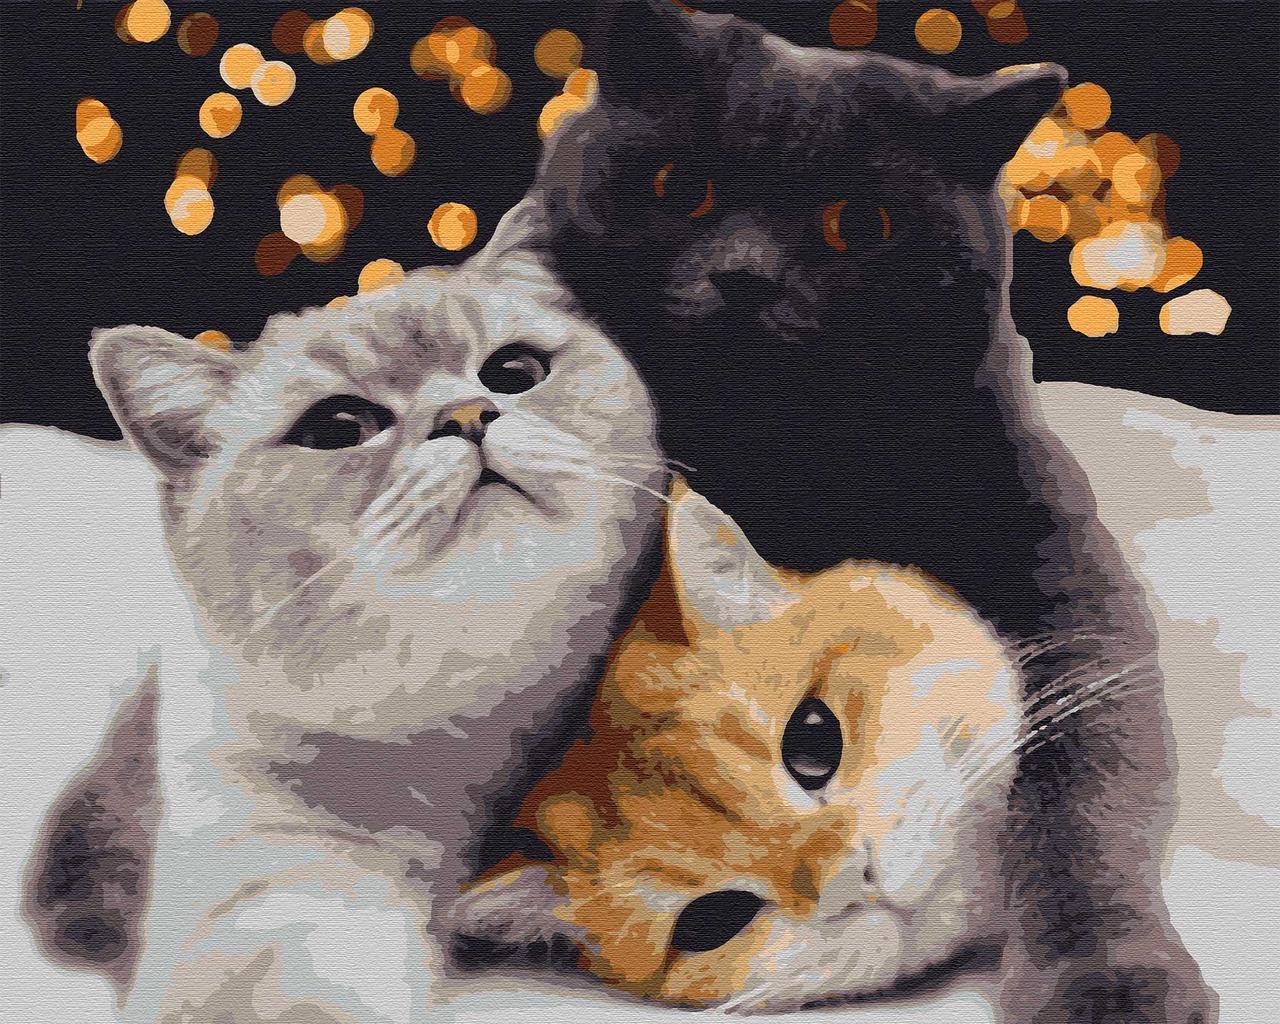 Картини за номерами тварини кішки 40х50 Вечірка